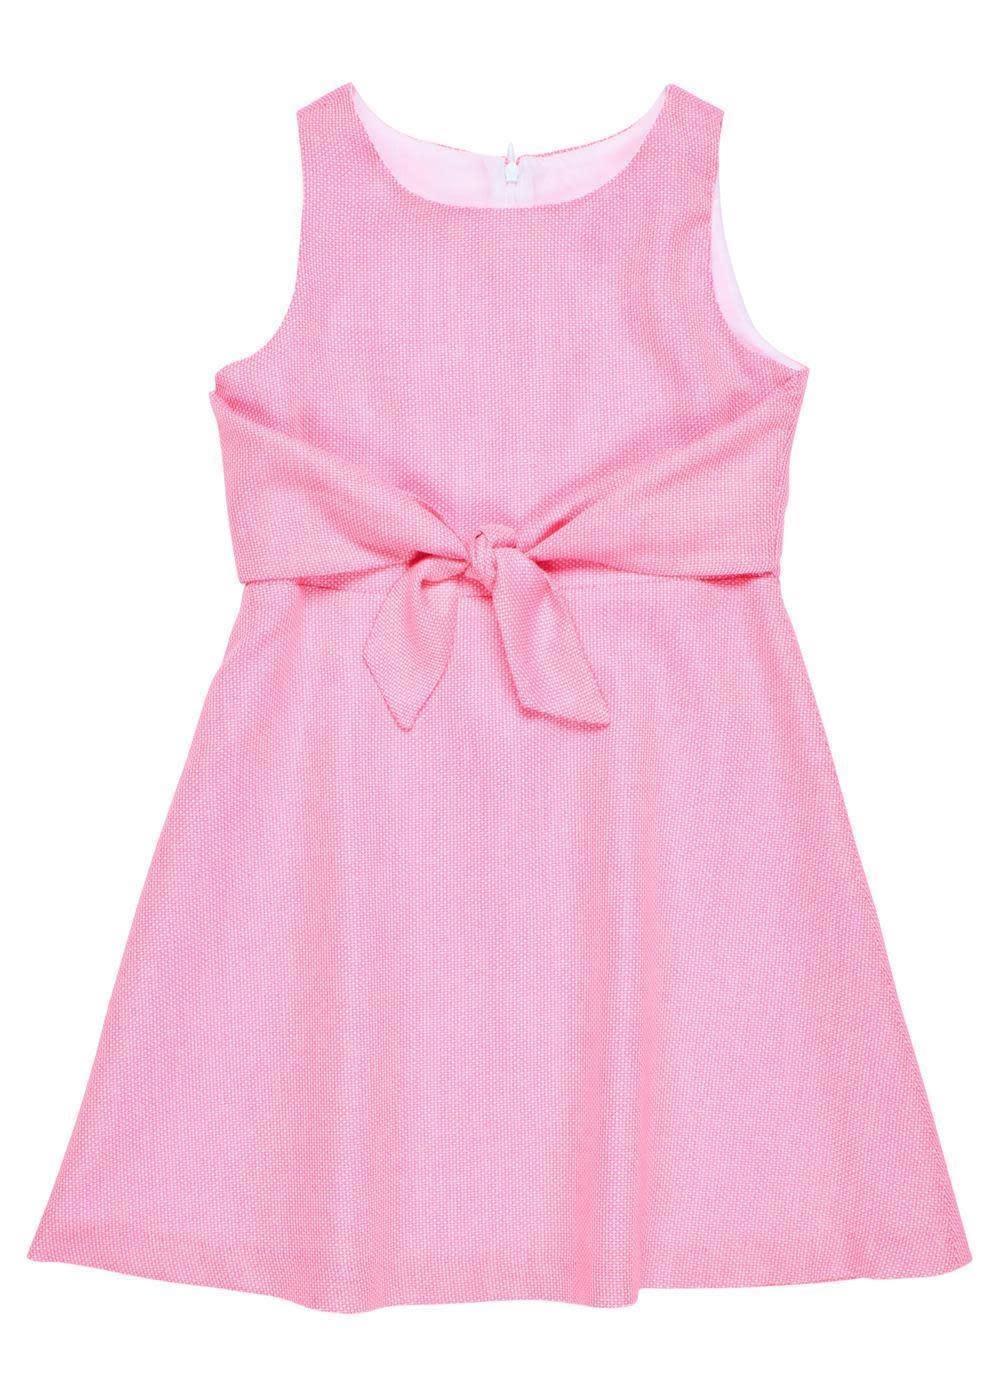 Florence Eiseman Front Tie Pique Dress